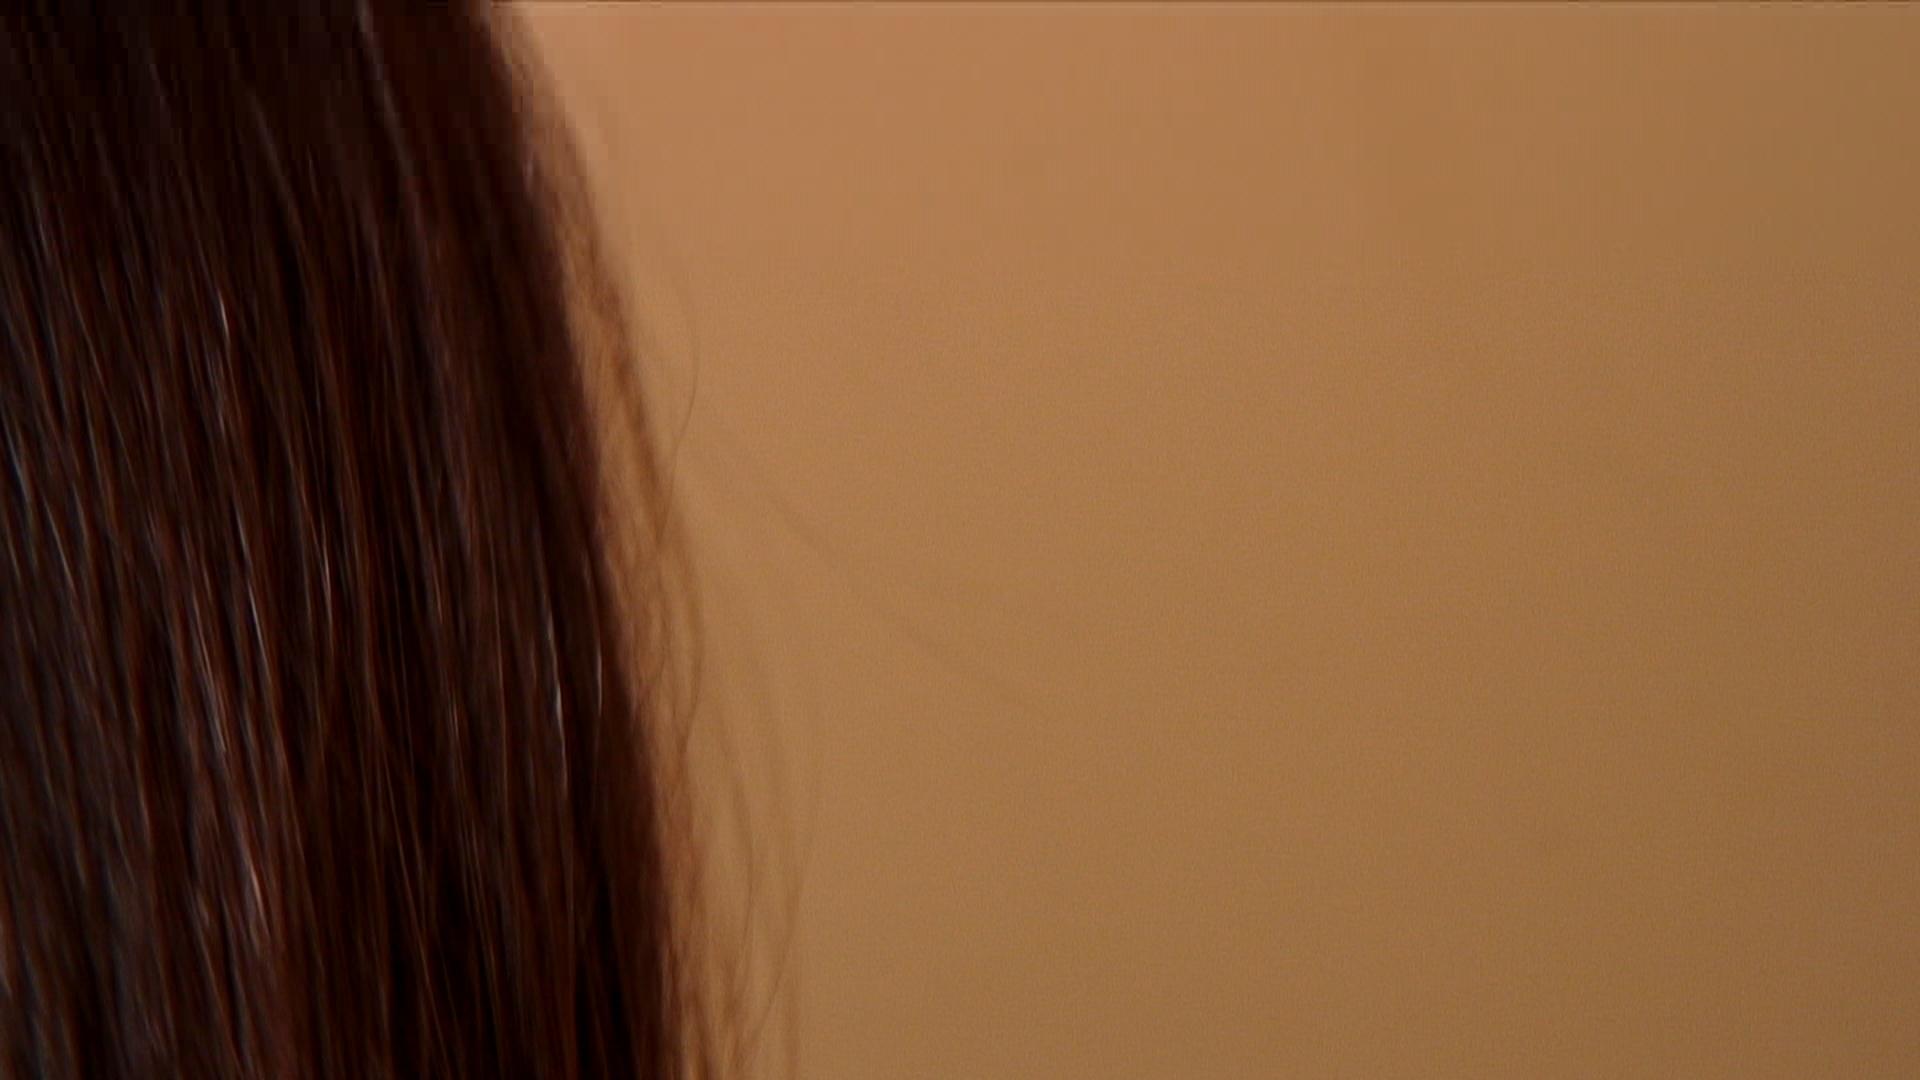 Rohan Quine, 'The Imagination Thief' - film 'JAYMI 115', still 27